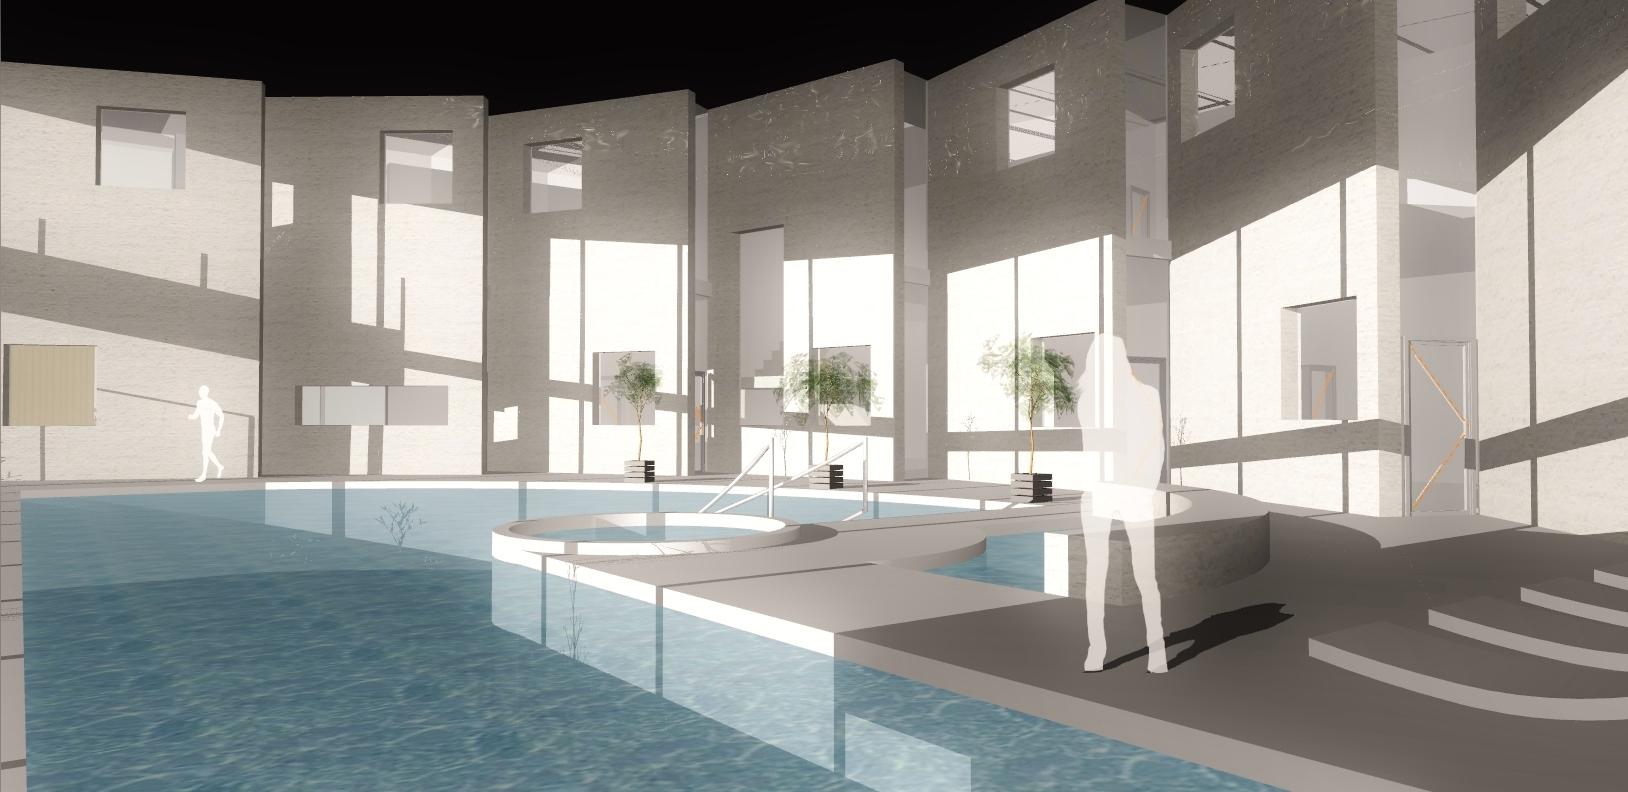 AQUAMARINA II - koncepcja wnętrza basenu